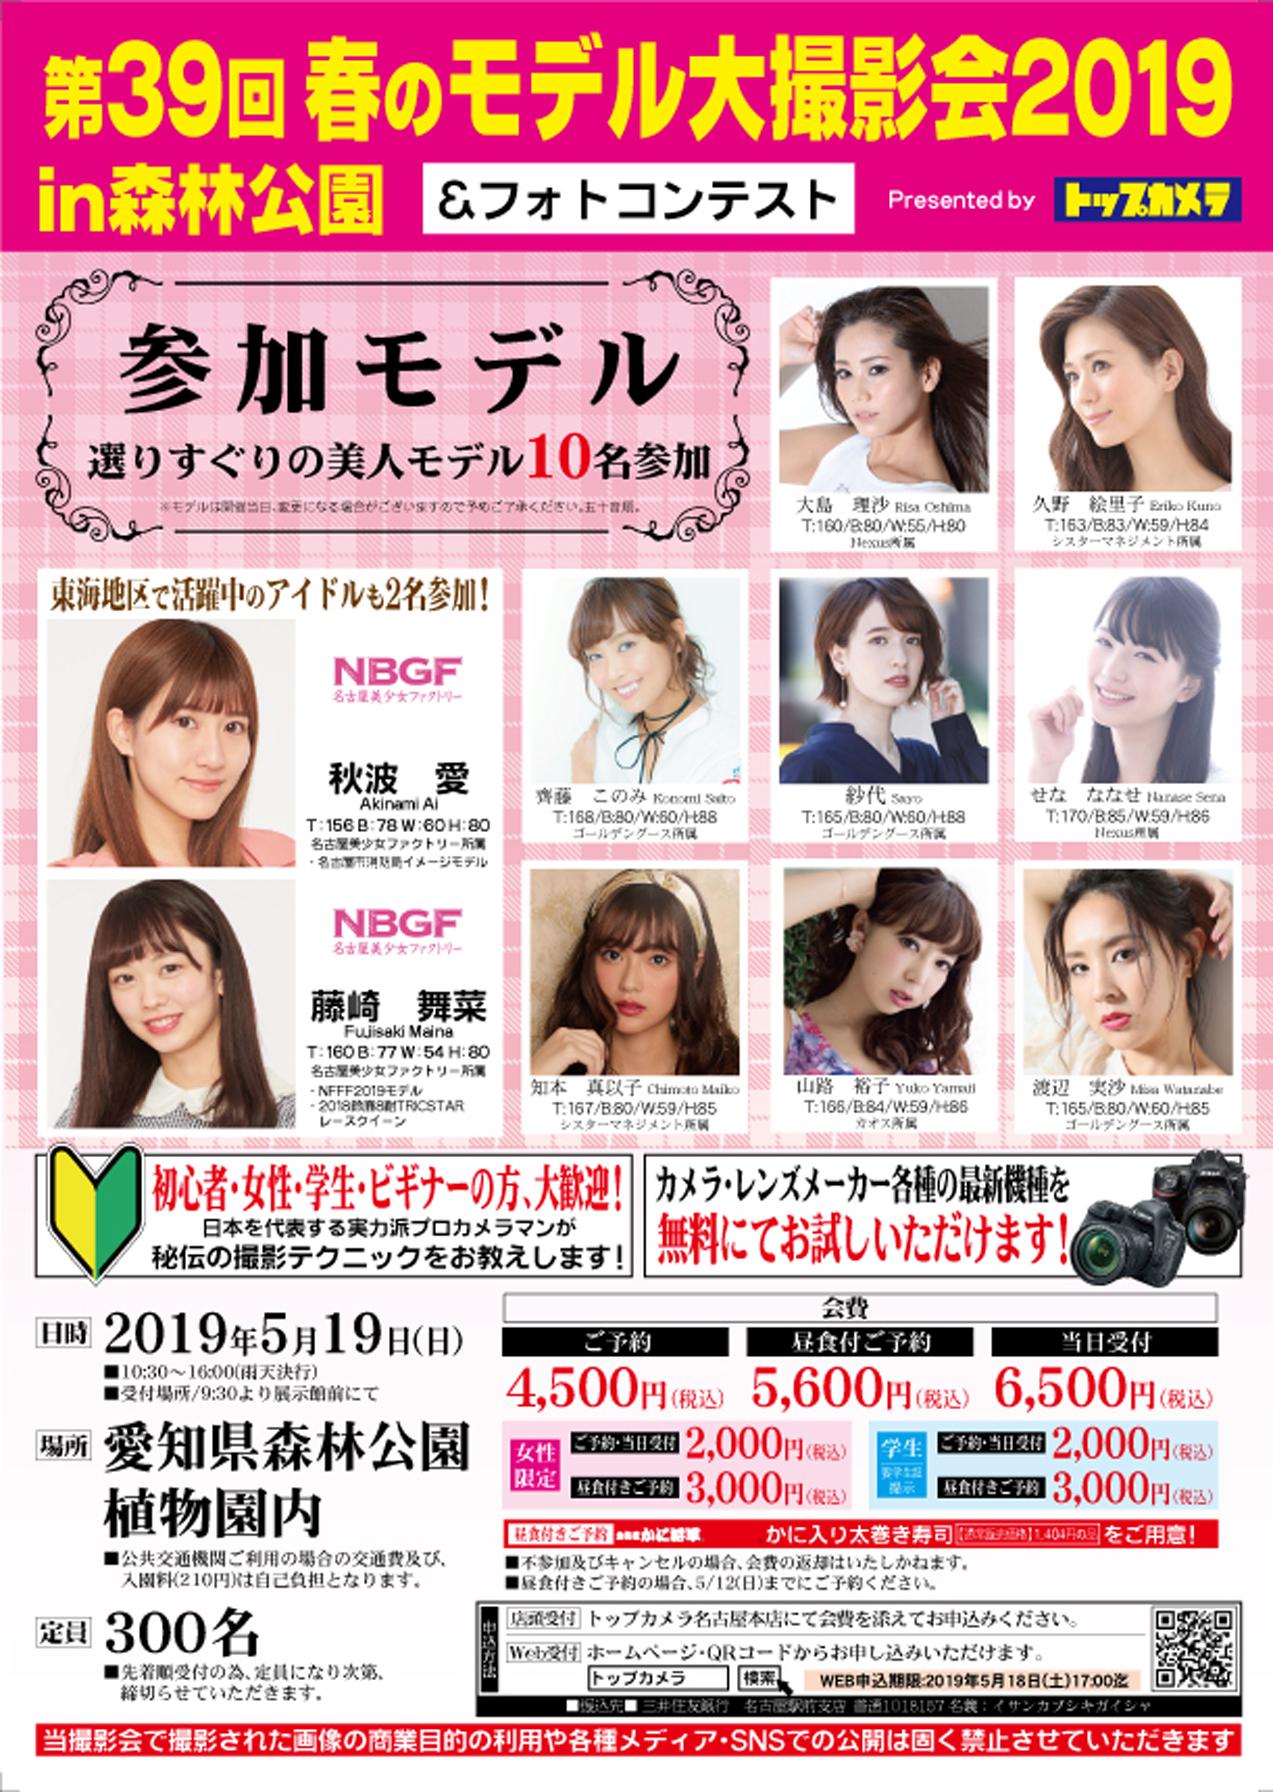 http://www.topcamera.co.jp/blog/wp-content/uploads/2019/03/de6ffc8792b50c7ec7c96dc8a8e5c5681.jpg